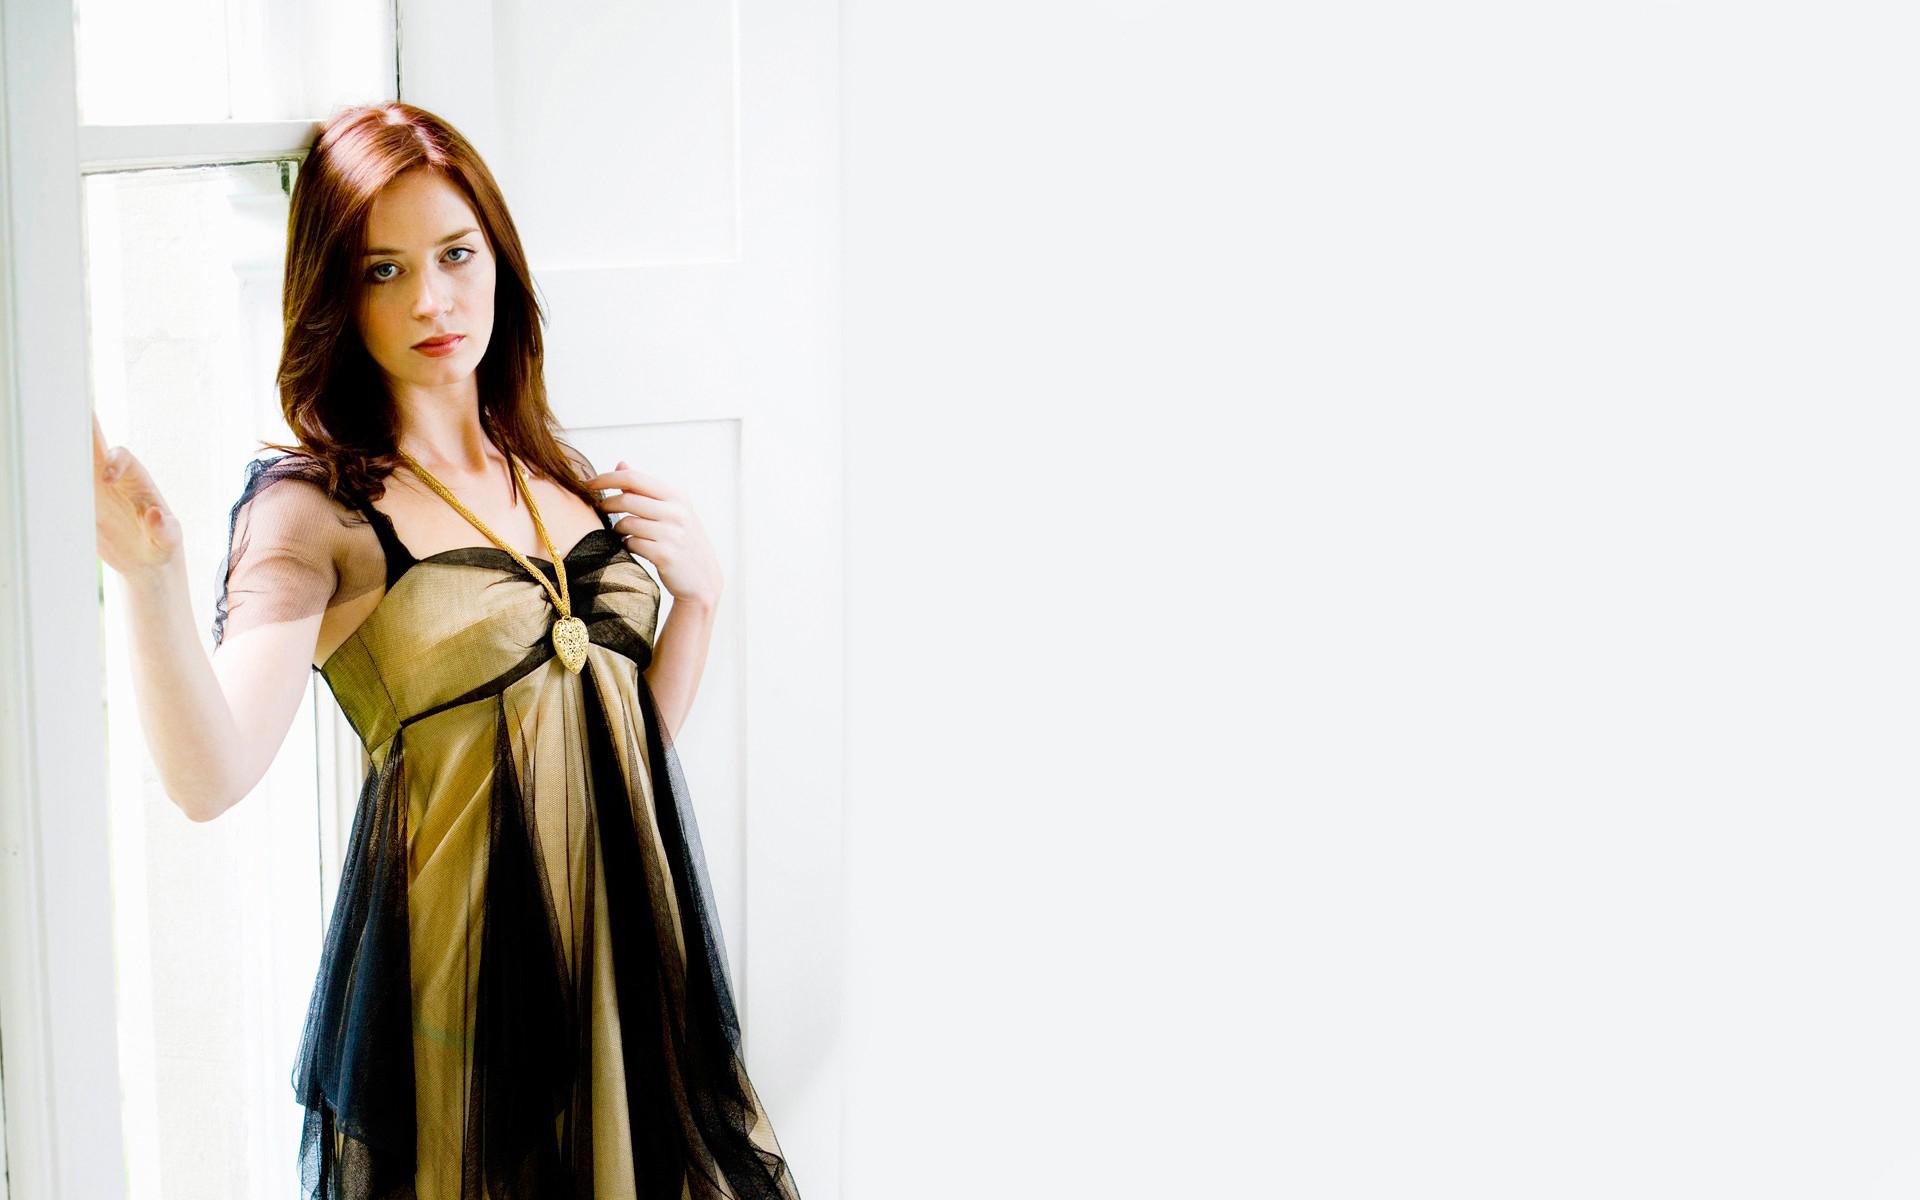 Emily Blunt 2014 Image...